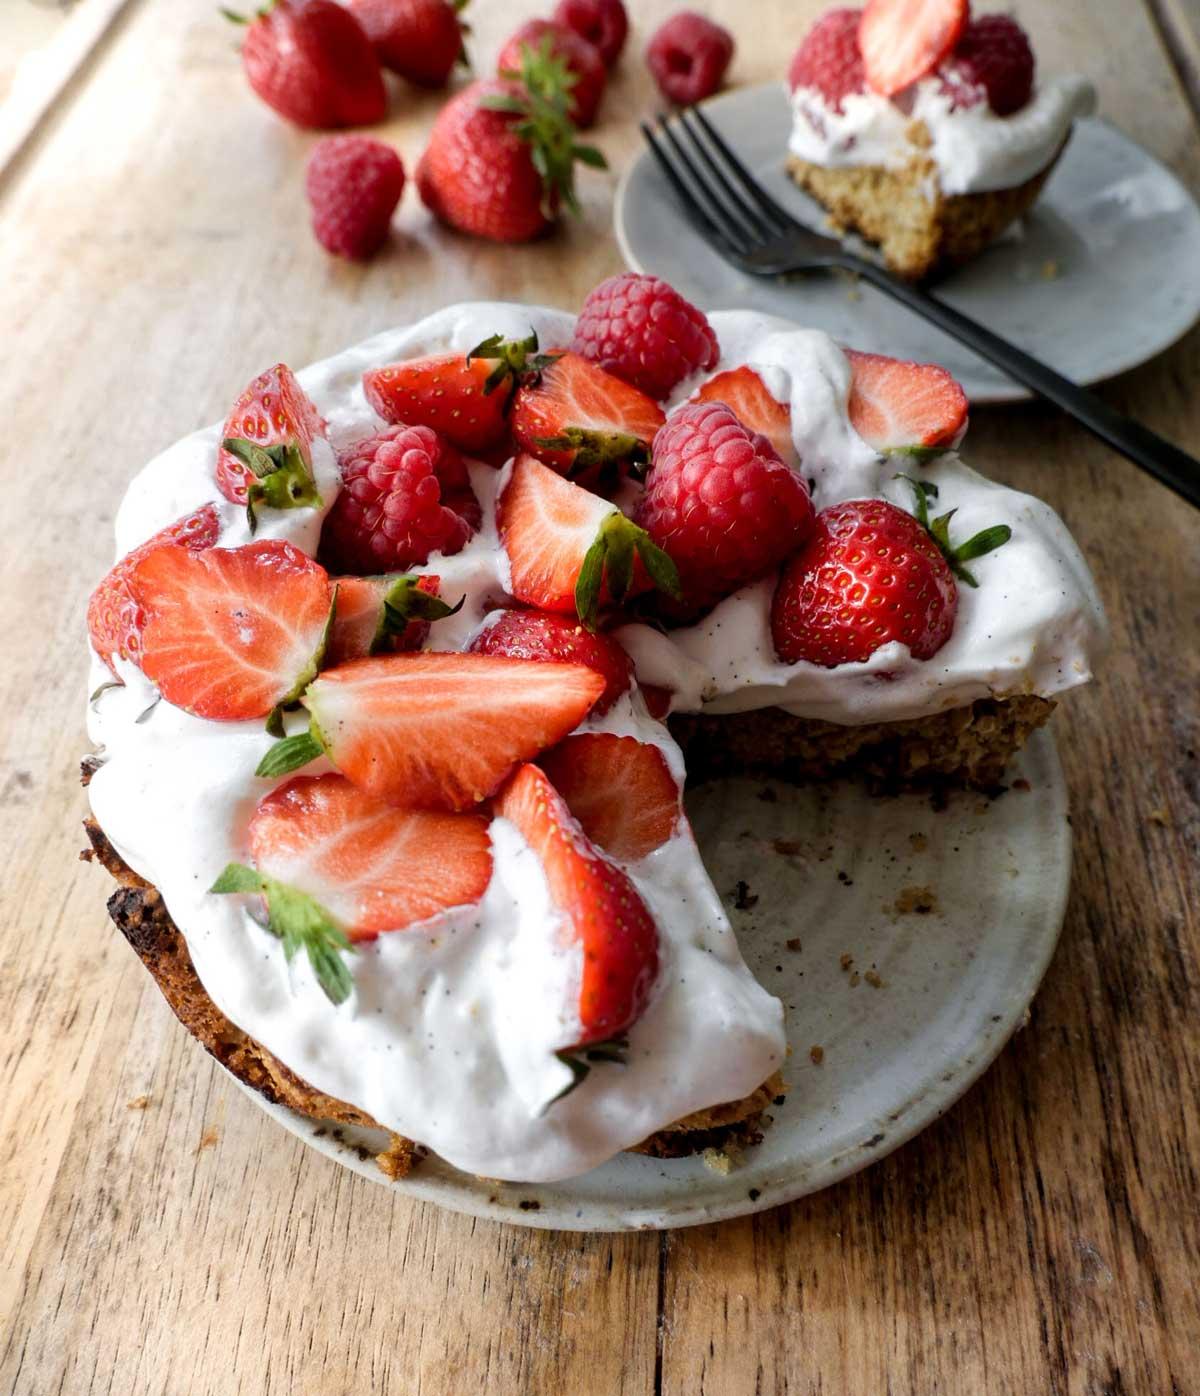 havretærte med creme vanilje og jordbær vegansk opskrift